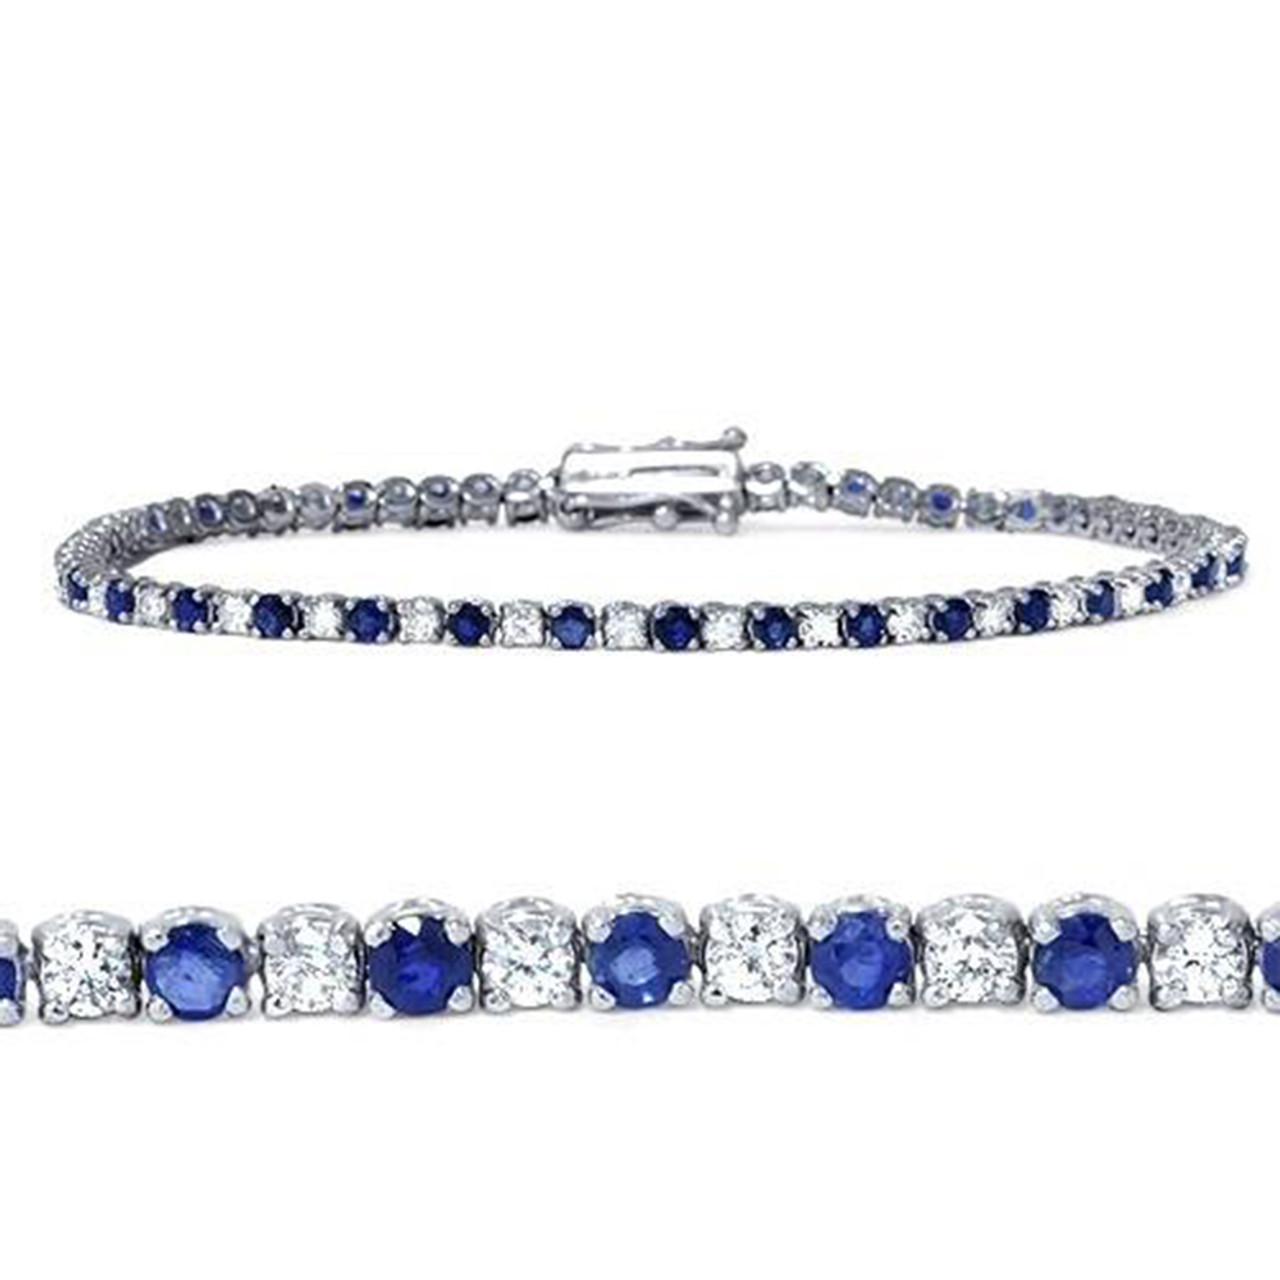 Women 18K Gold Plated Oval Cut Blue Sapphire Tennis Xmas Party Gift Bracelet